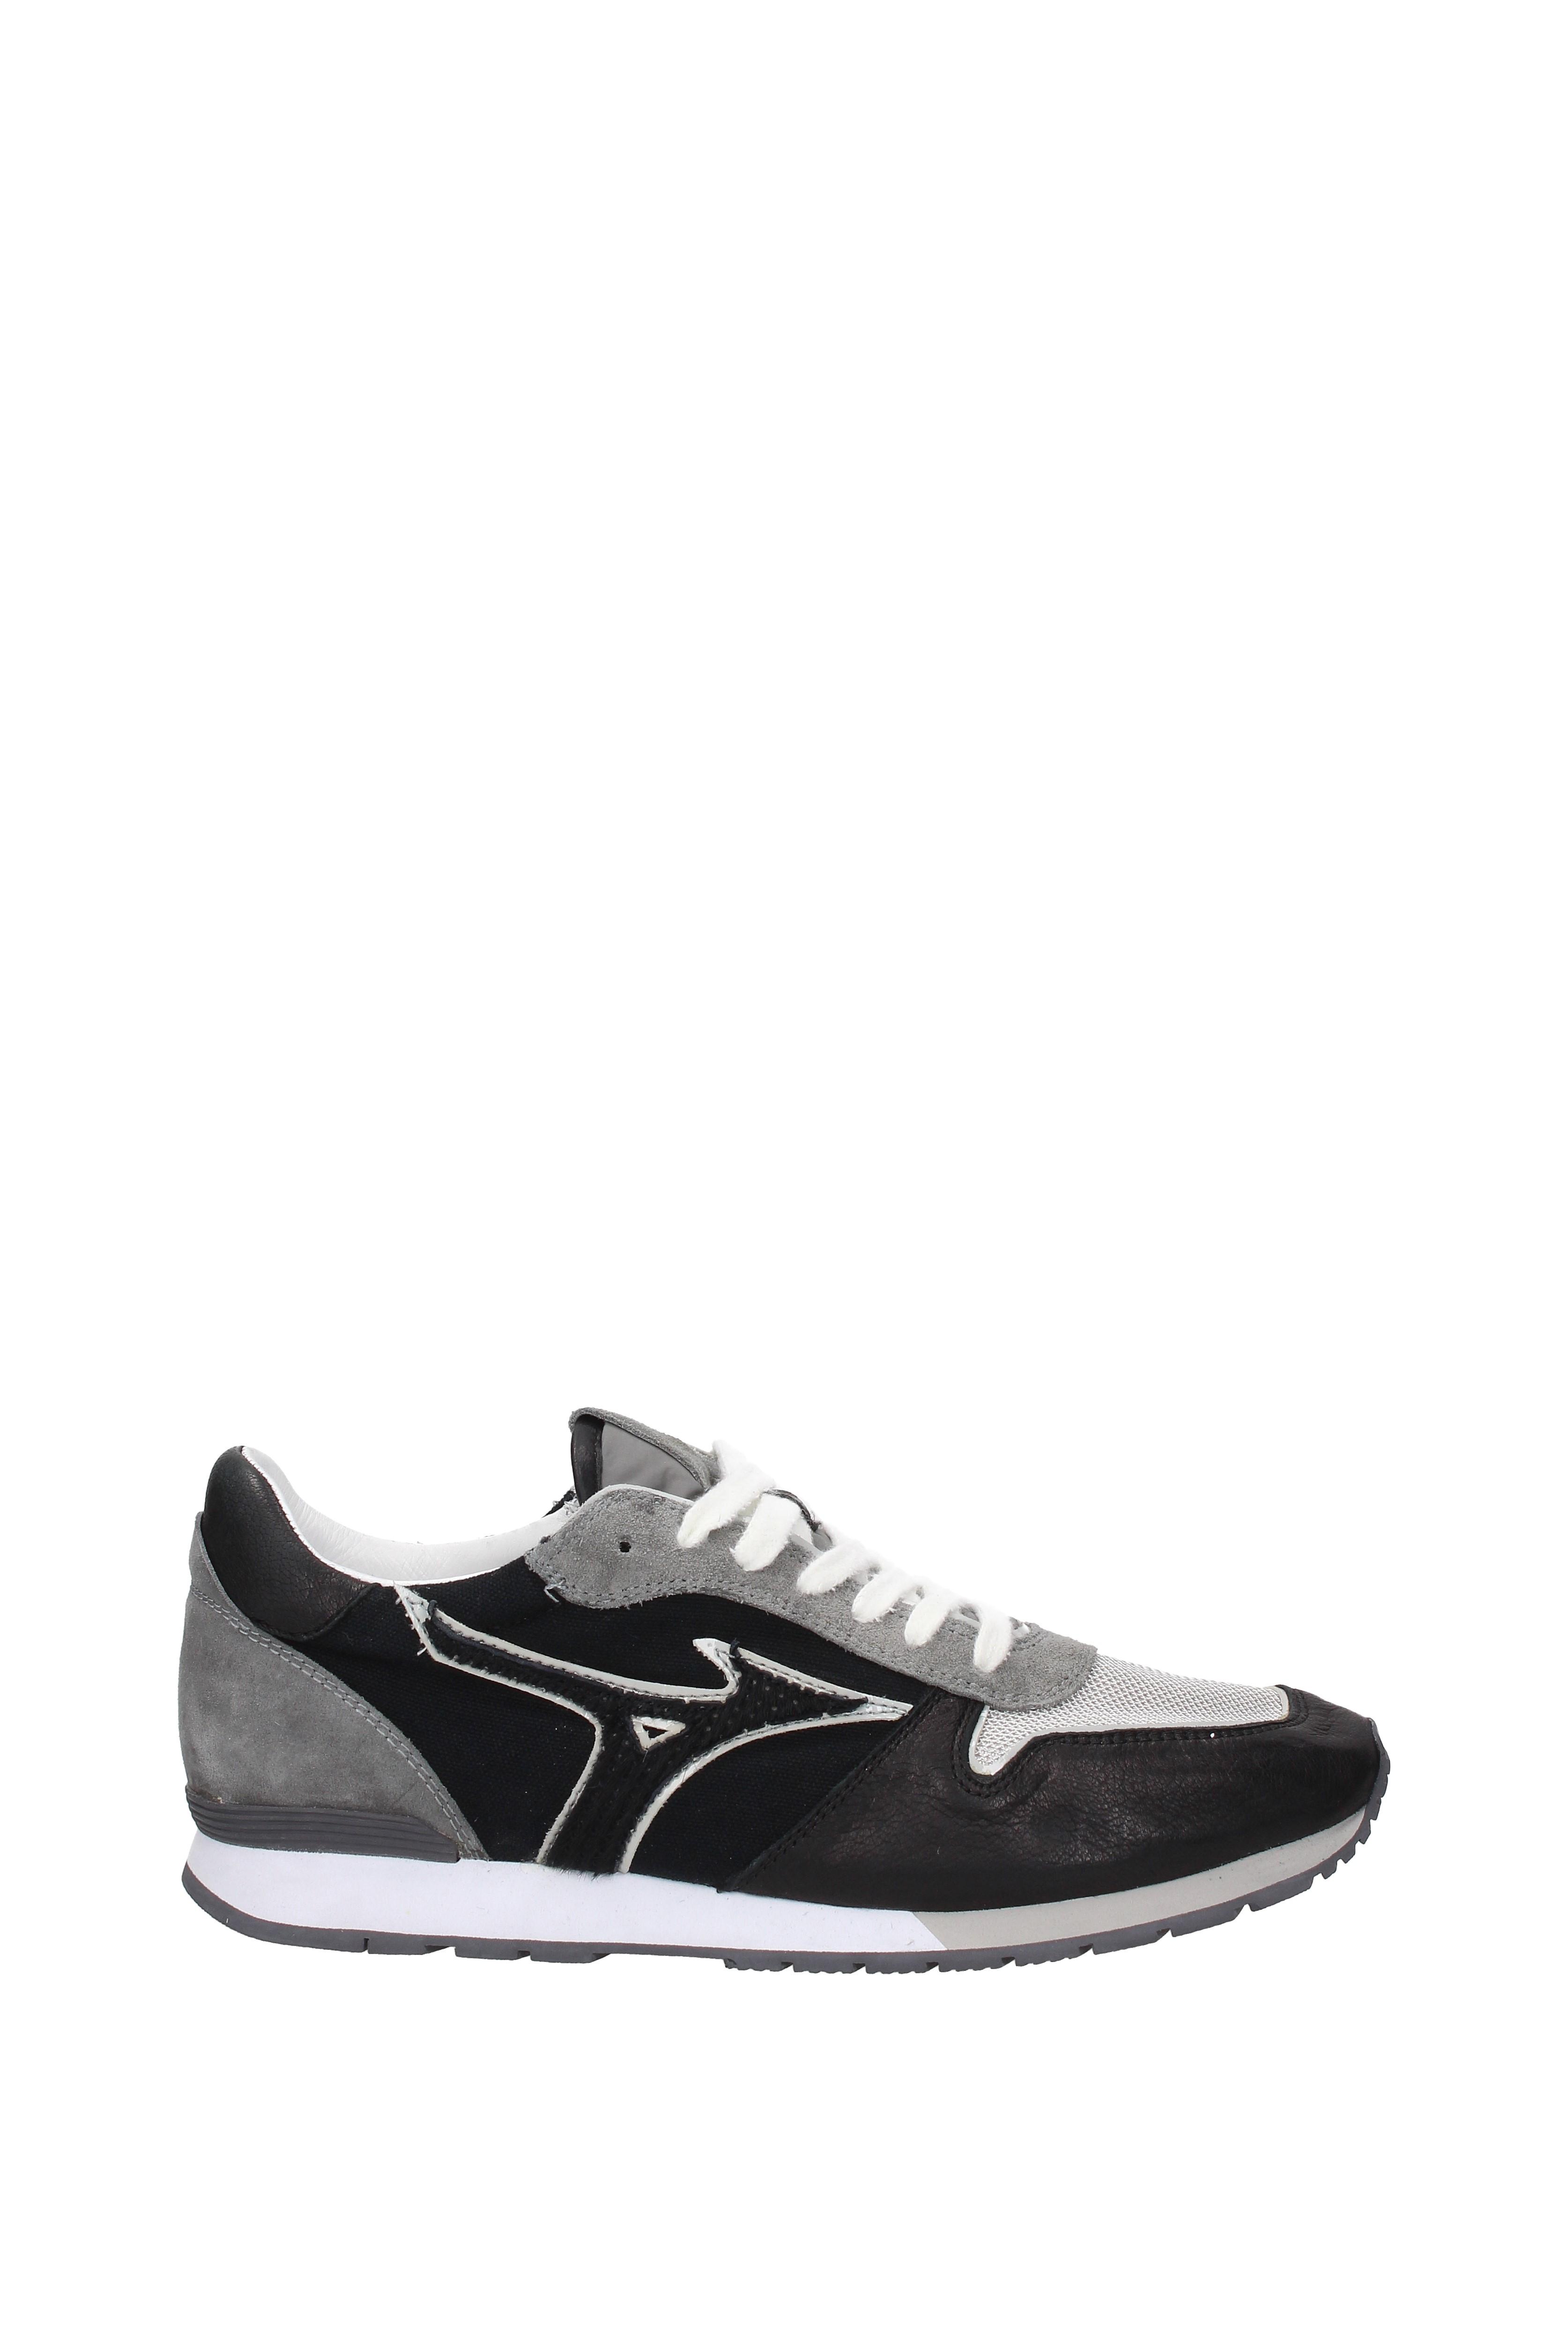 Sneakers Mizuno etamin Herren Stoff - Stoff Herren (PELLED1GB1744) 5c77af